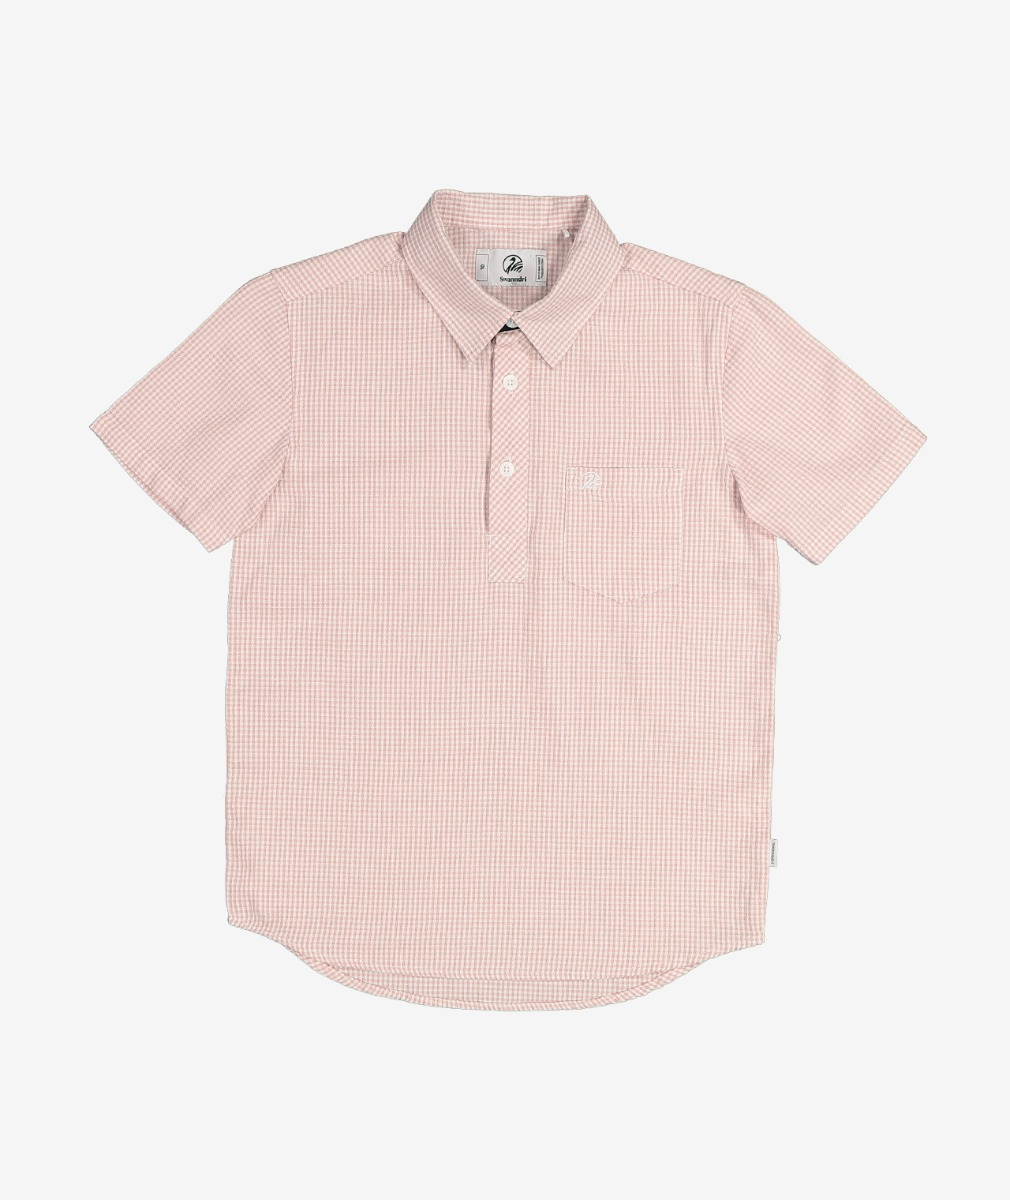 Swanndri Kid's Dragon Creek Cotton Shirt in Pink/White Gingham